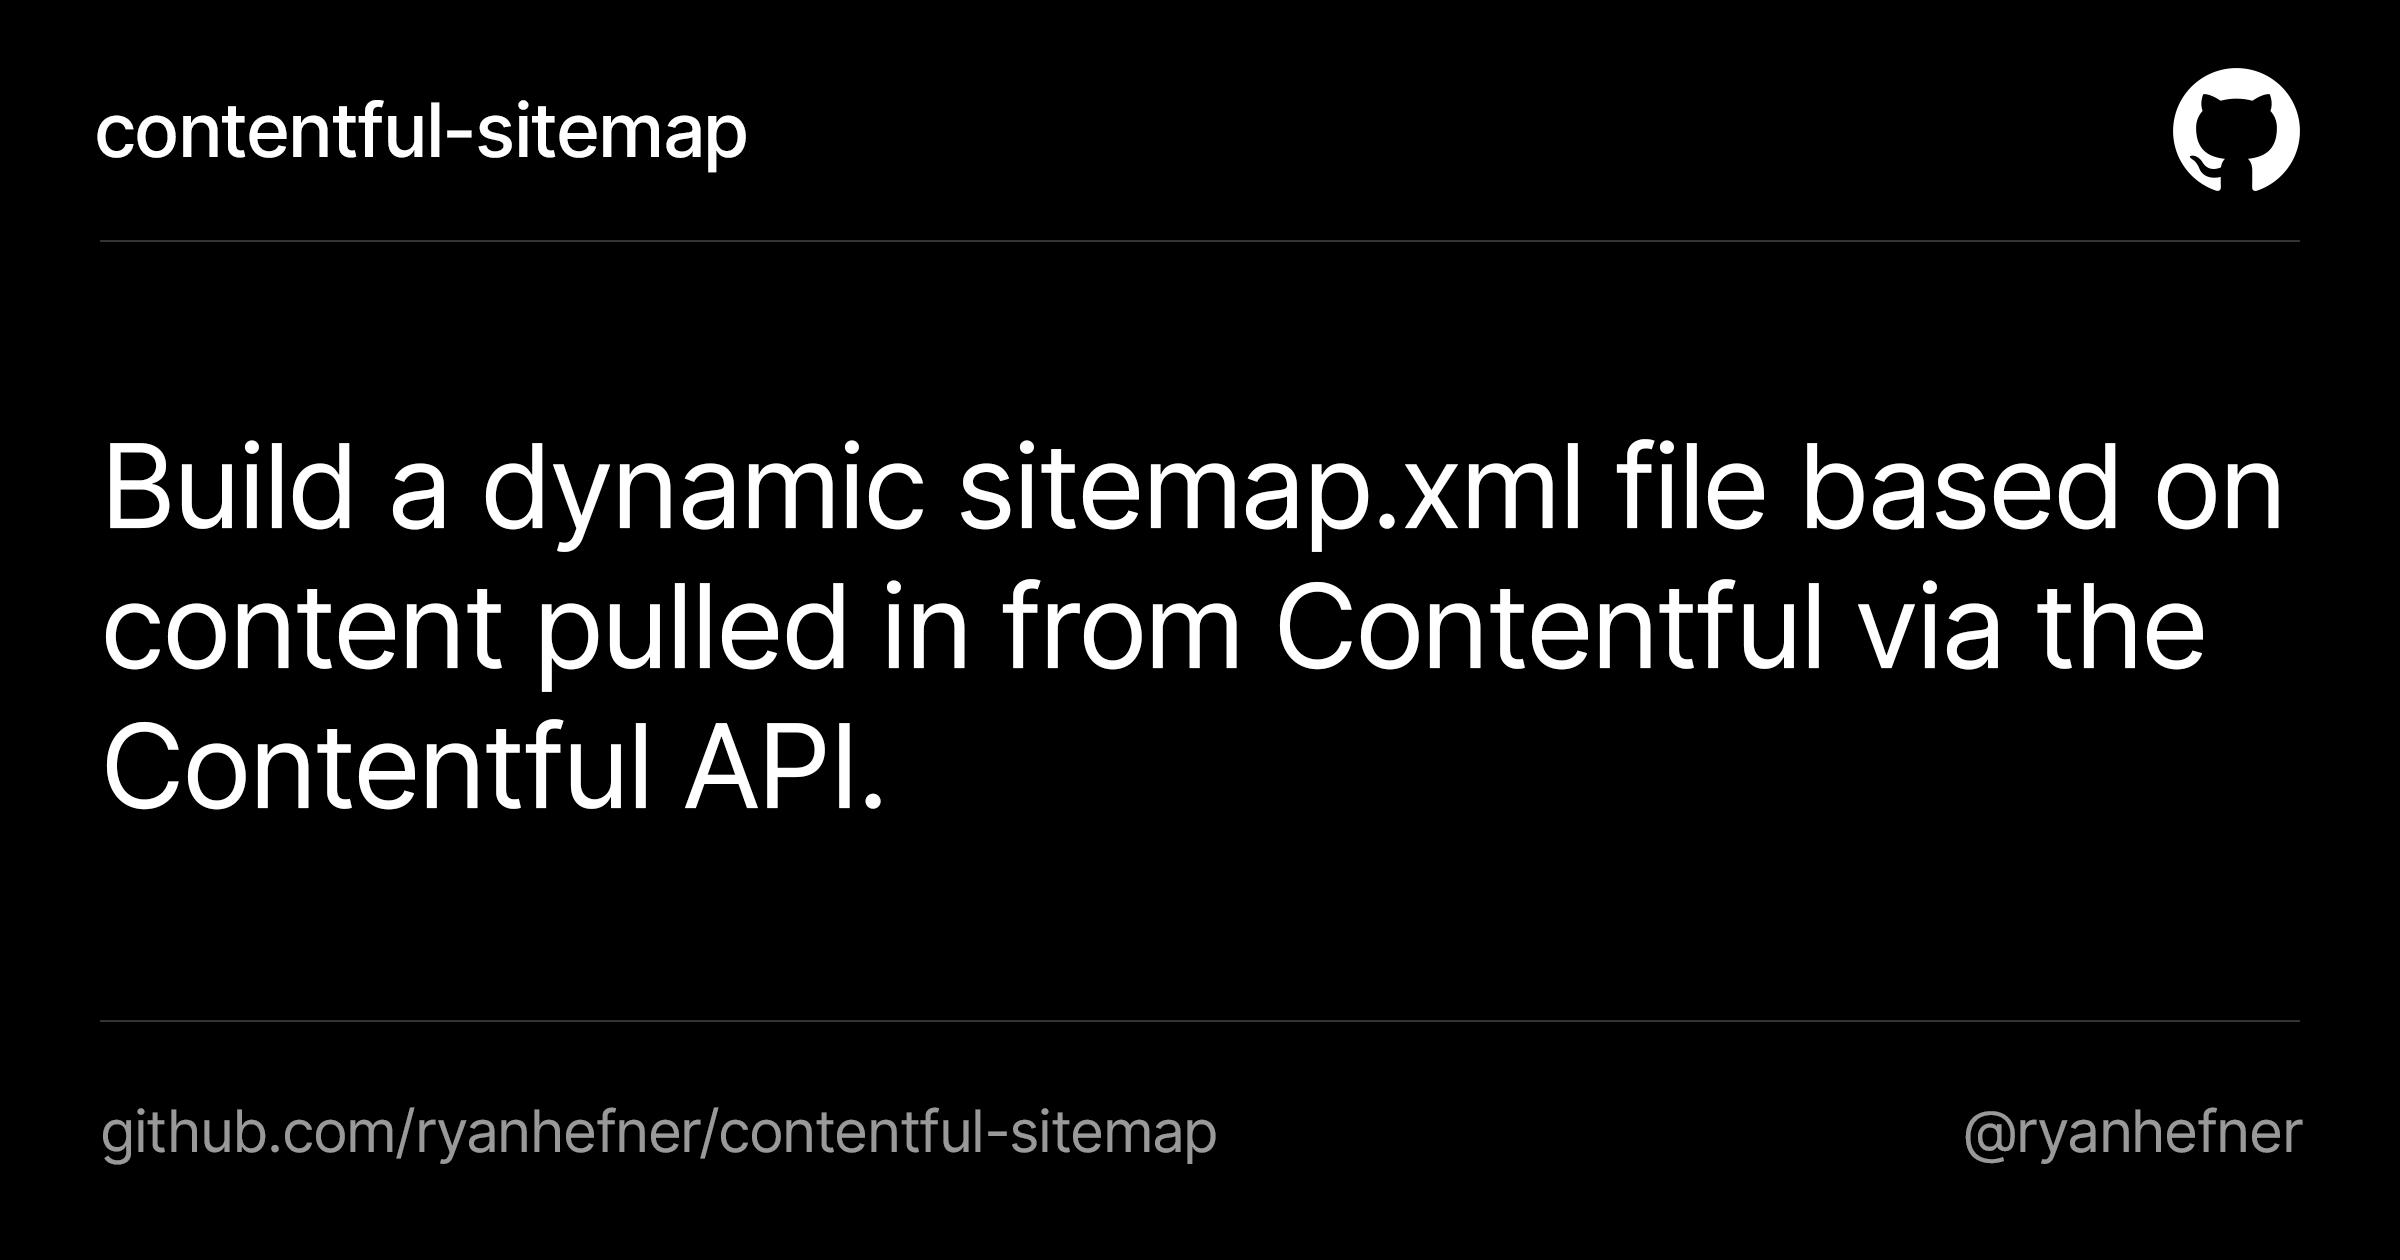 contentful-sitemap